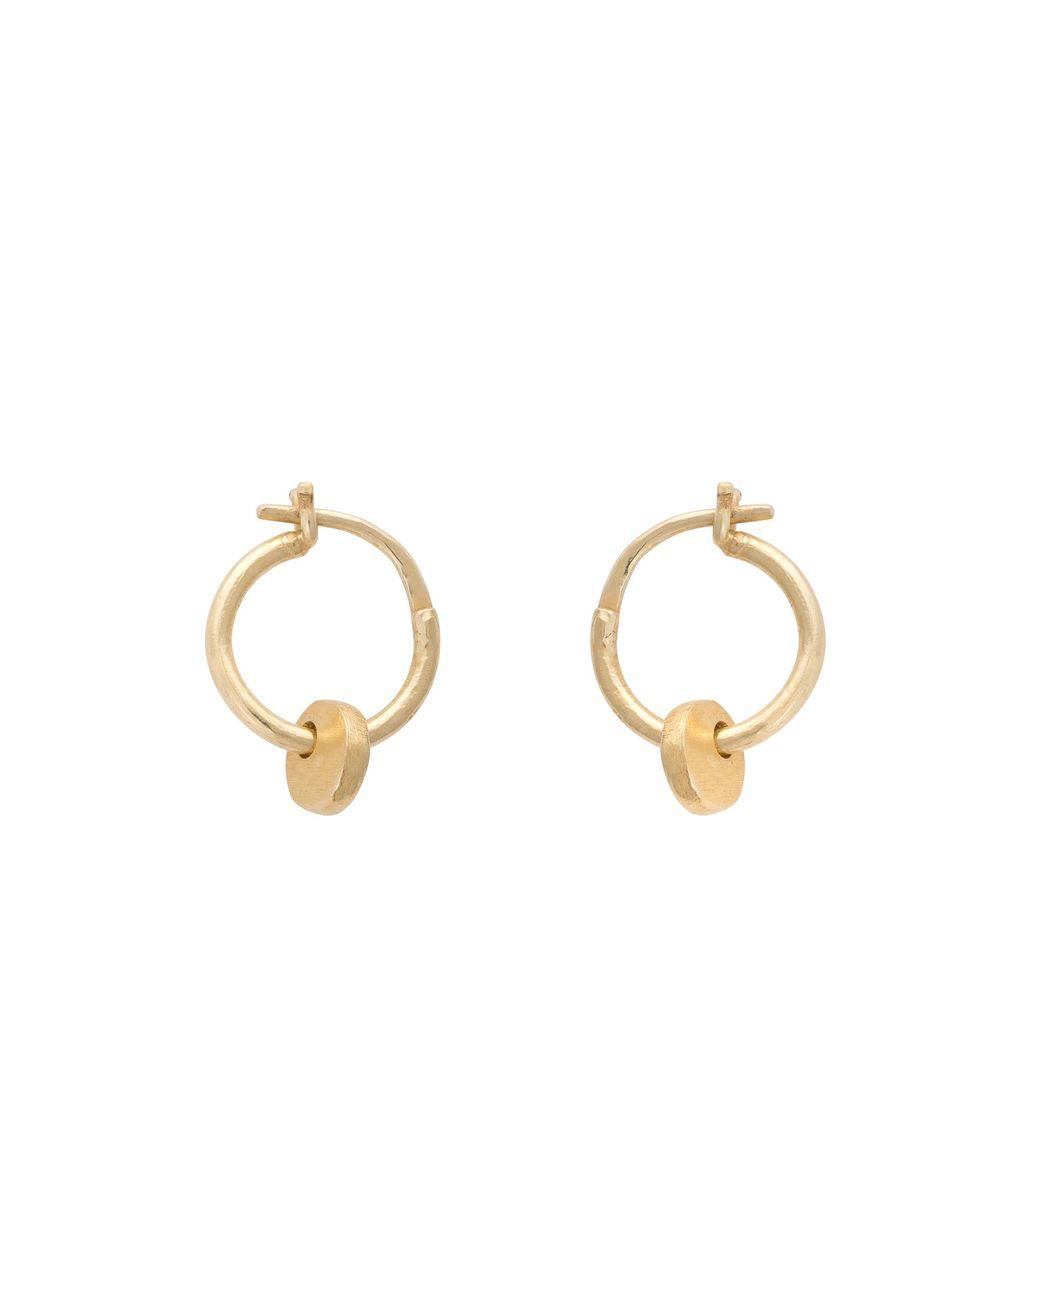 82d020d23 Oliver Bonas Elsa Small Circle Drop Hoop Earrings in Metallic - Lyst